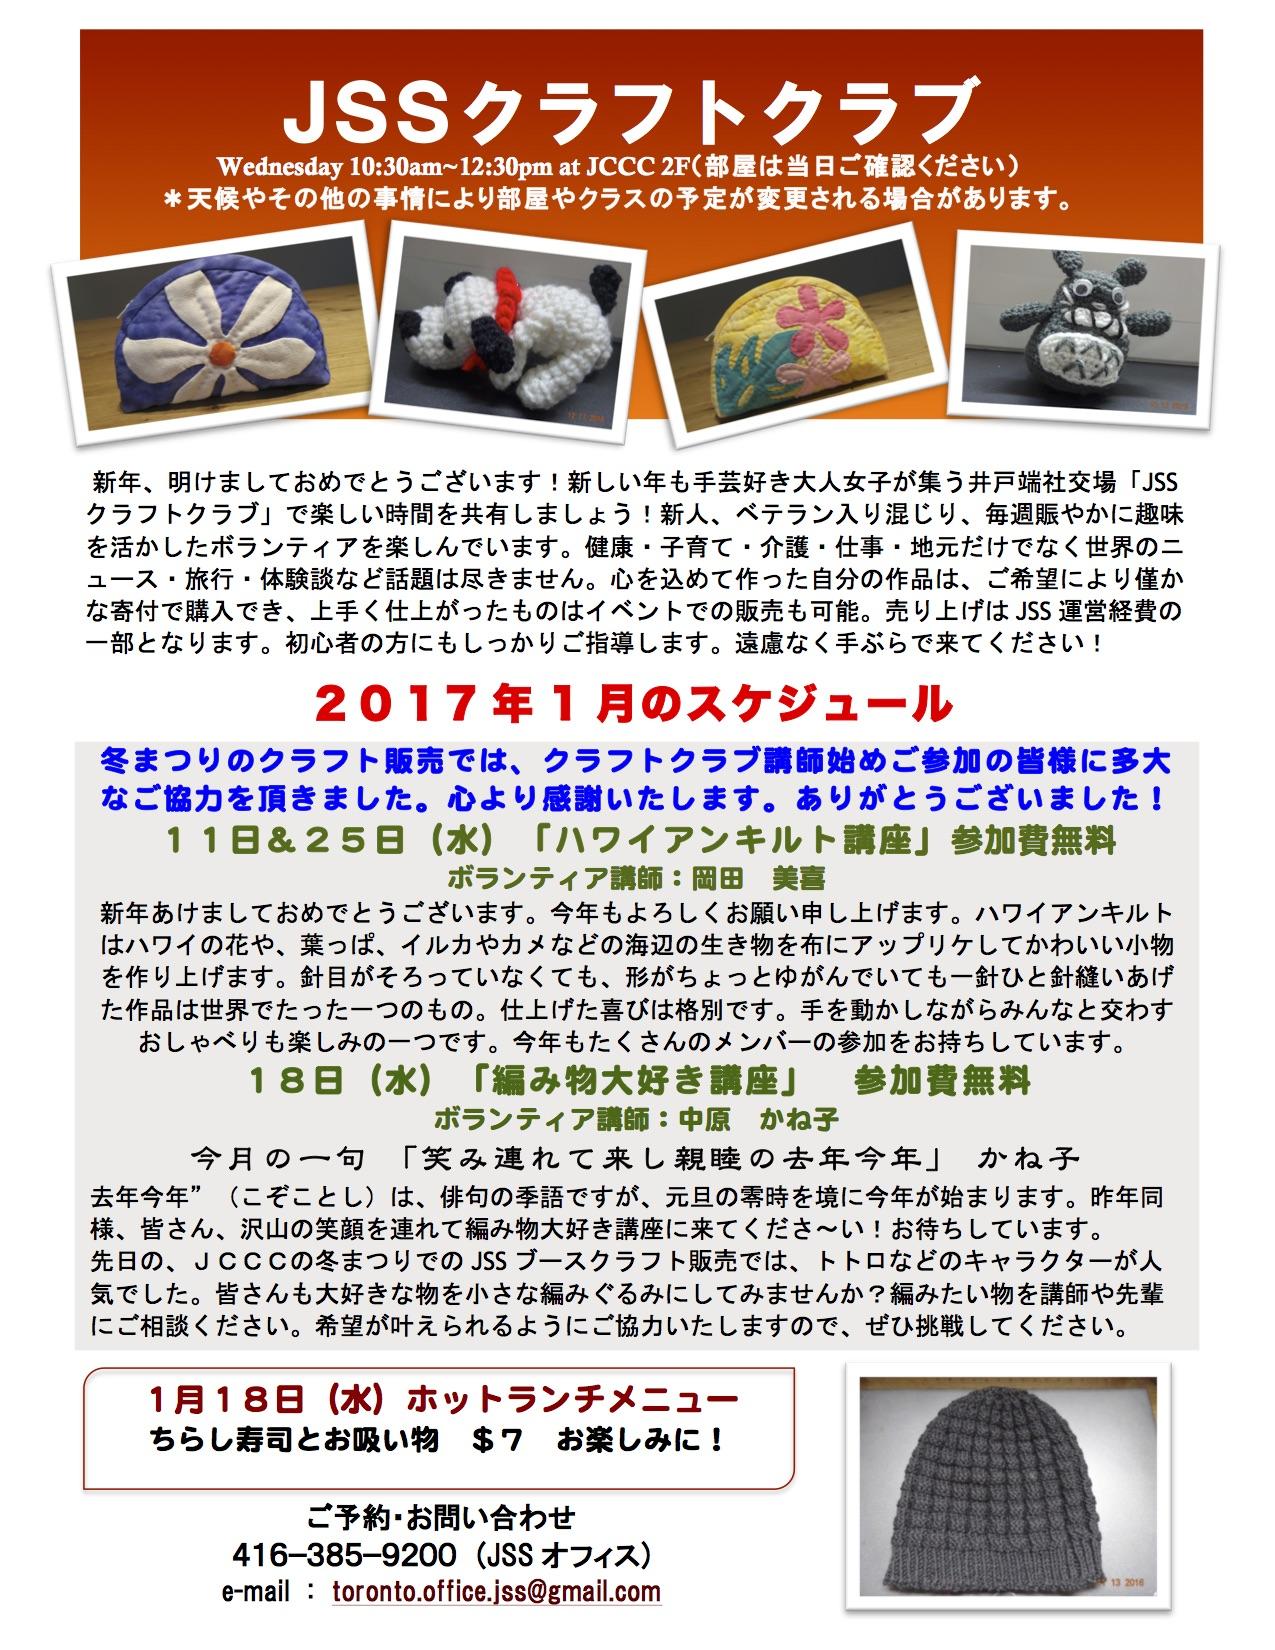 [:ja]JSS クラフトクラブ 1月の予定[:en]JSS Craft Club January Schedule[:]